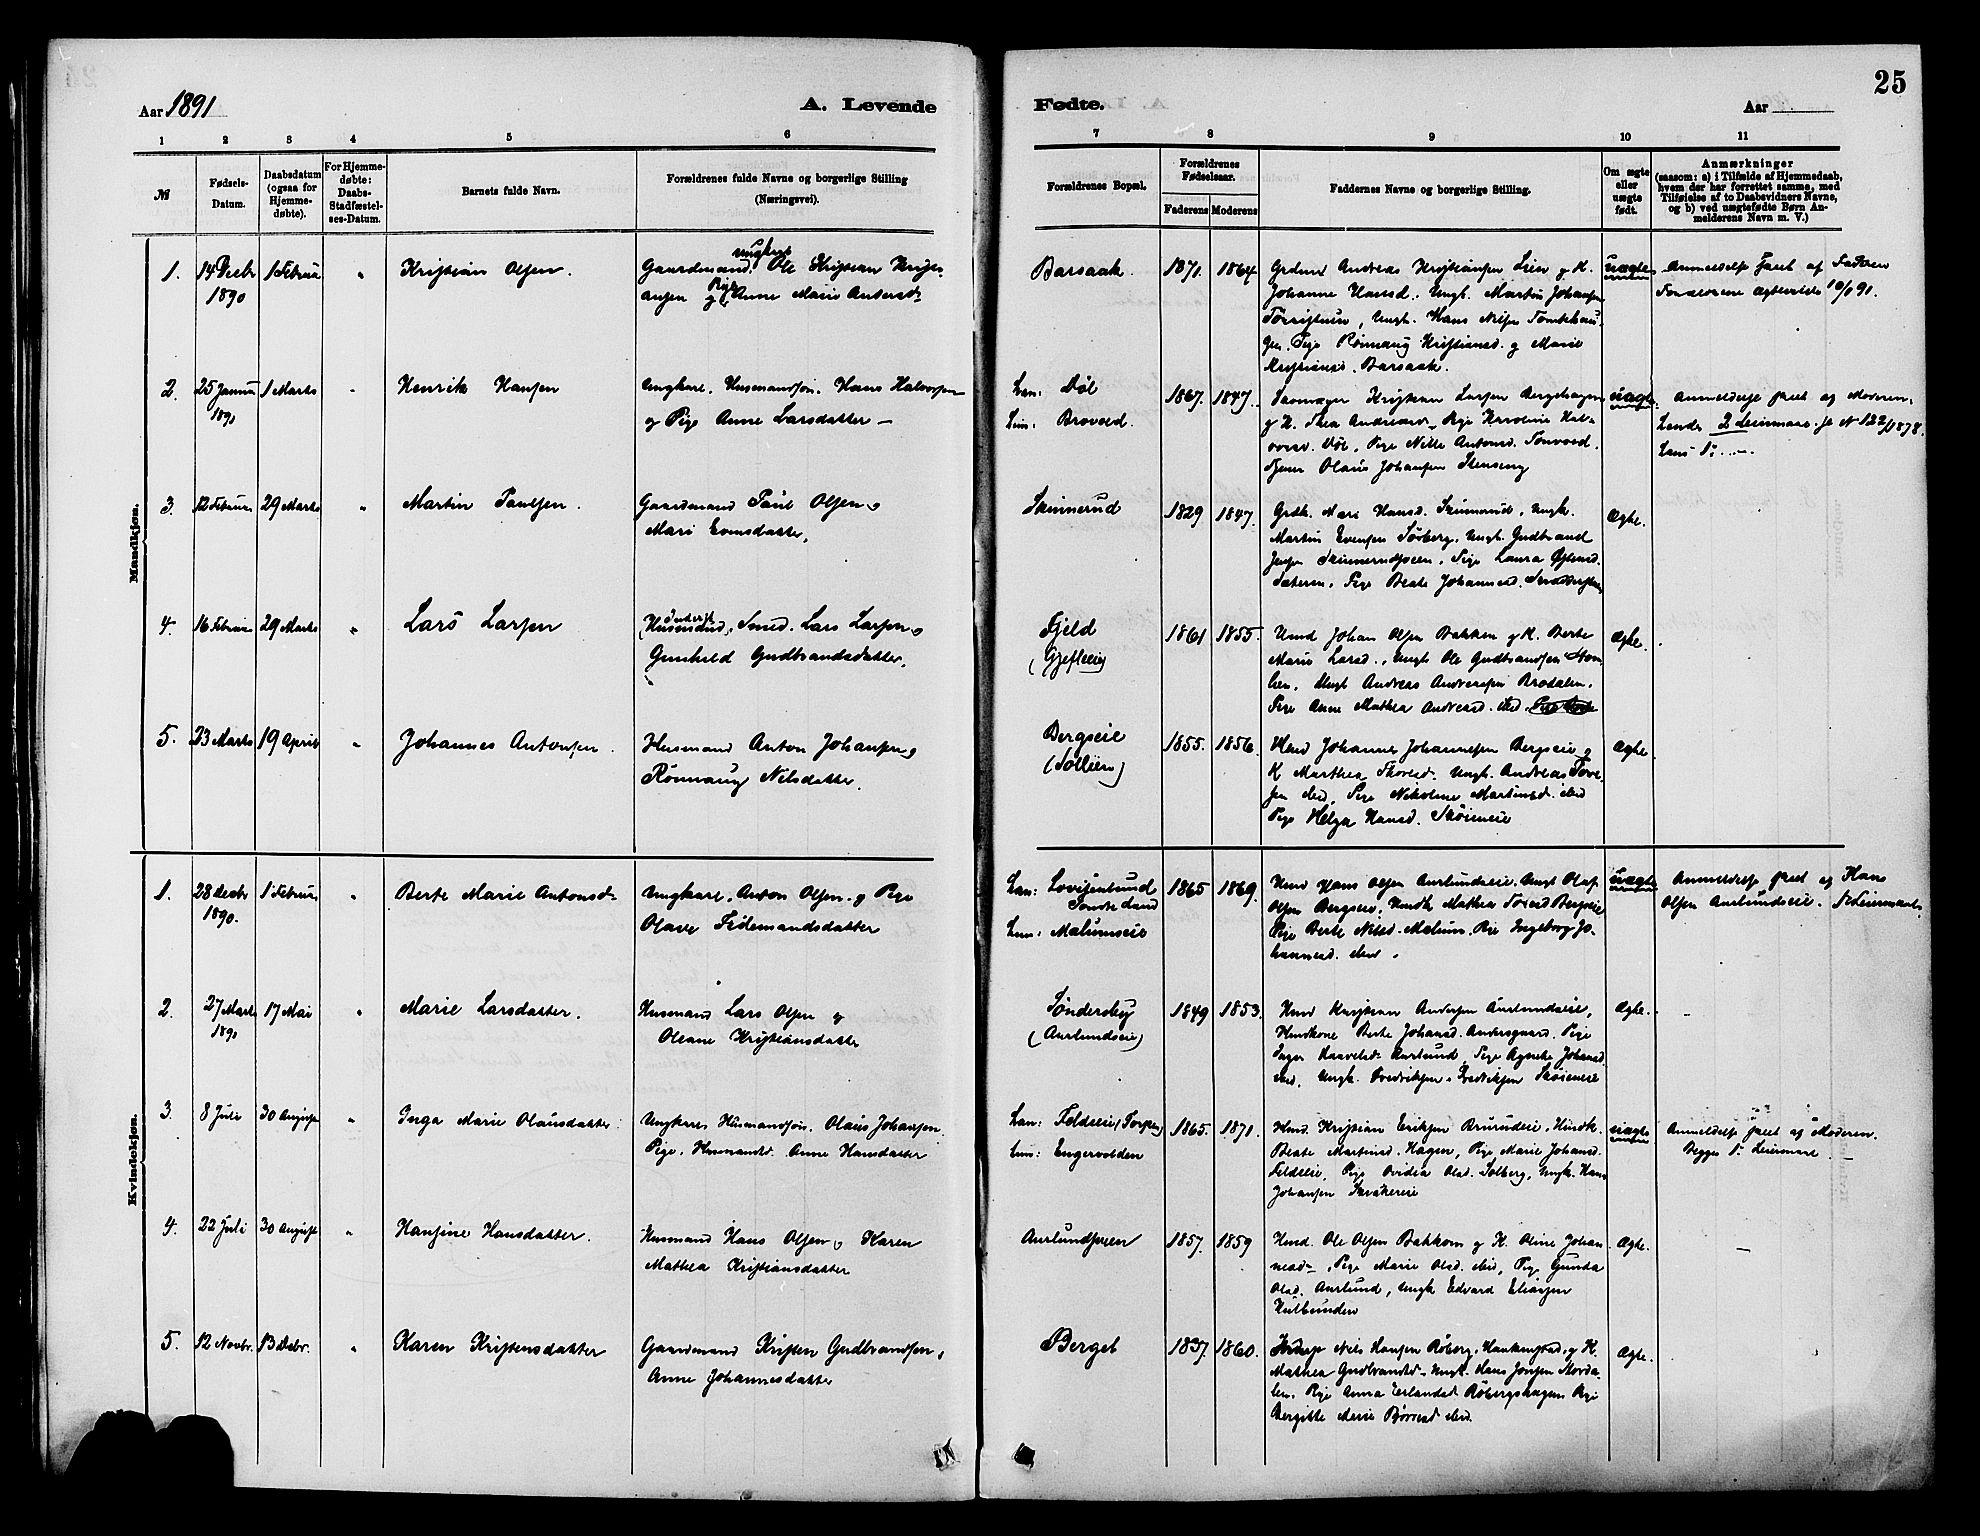 SAH, Nordre Land prestekontor, Ministerialbok nr. 3, 1882-1896, s. 25